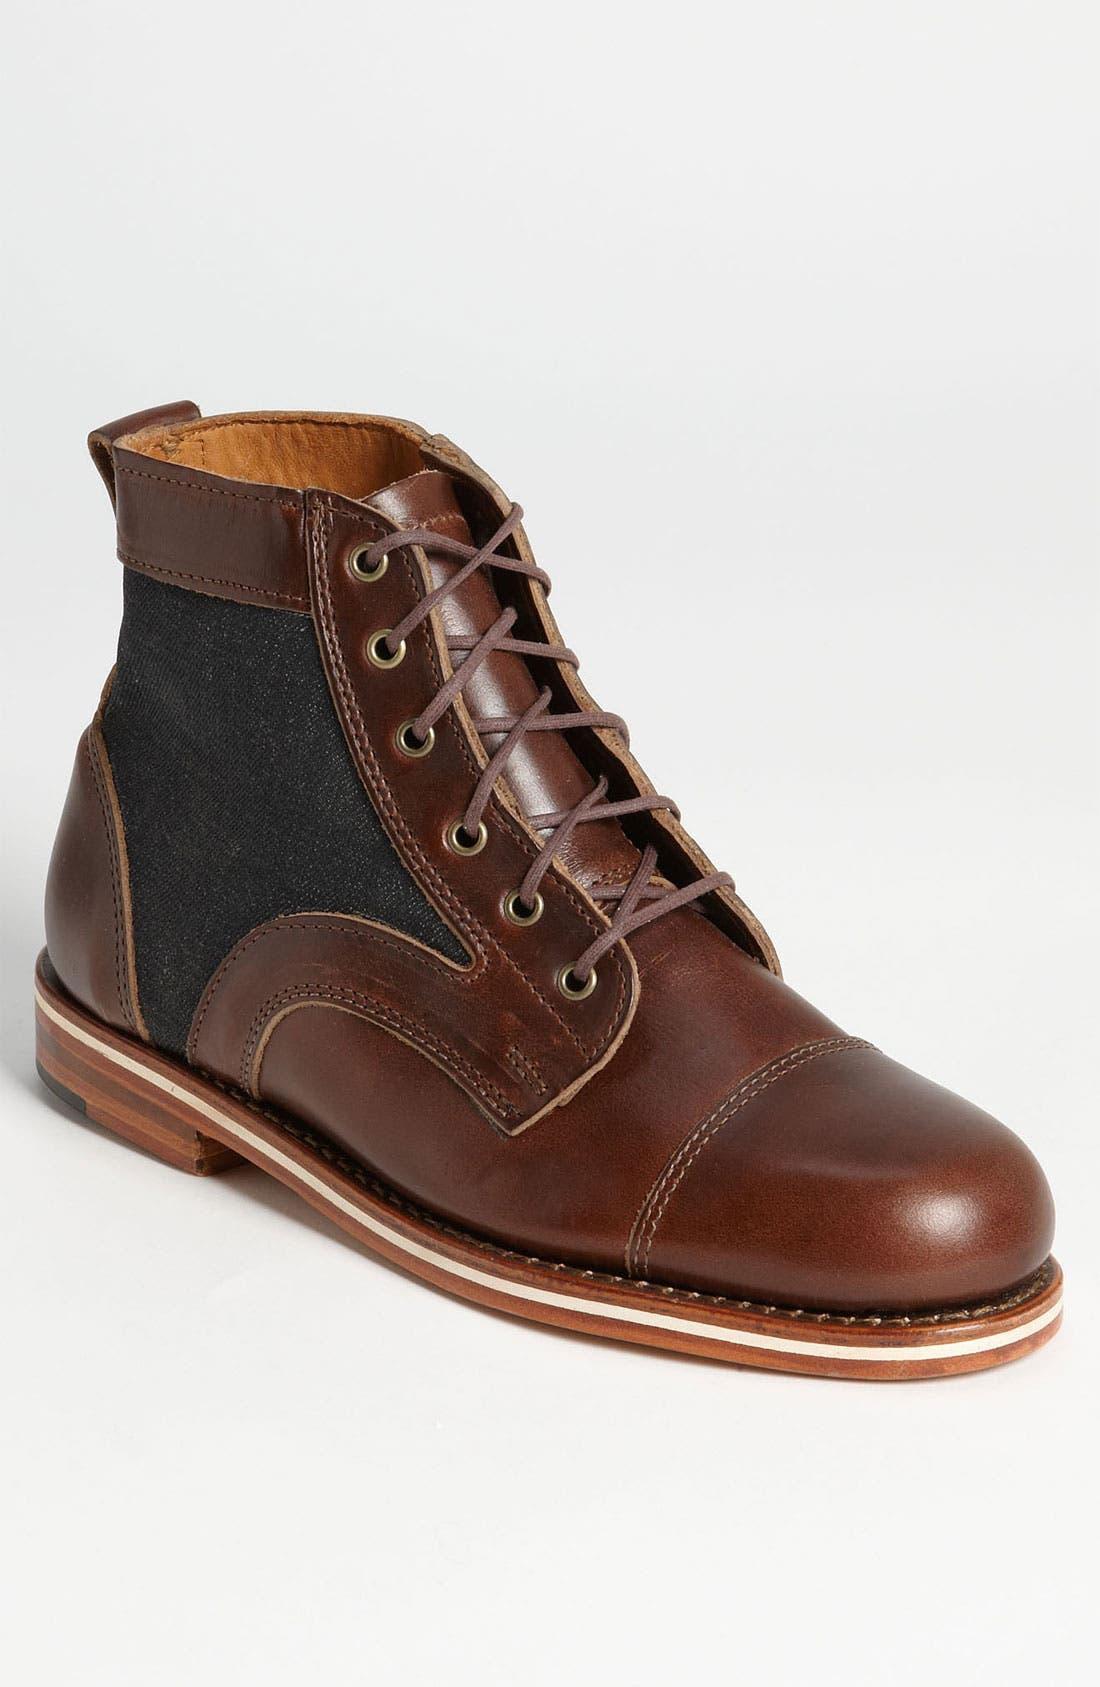 HELM, 'Reid' Cap Toe Boot, Main thumbnail 1, color, 200